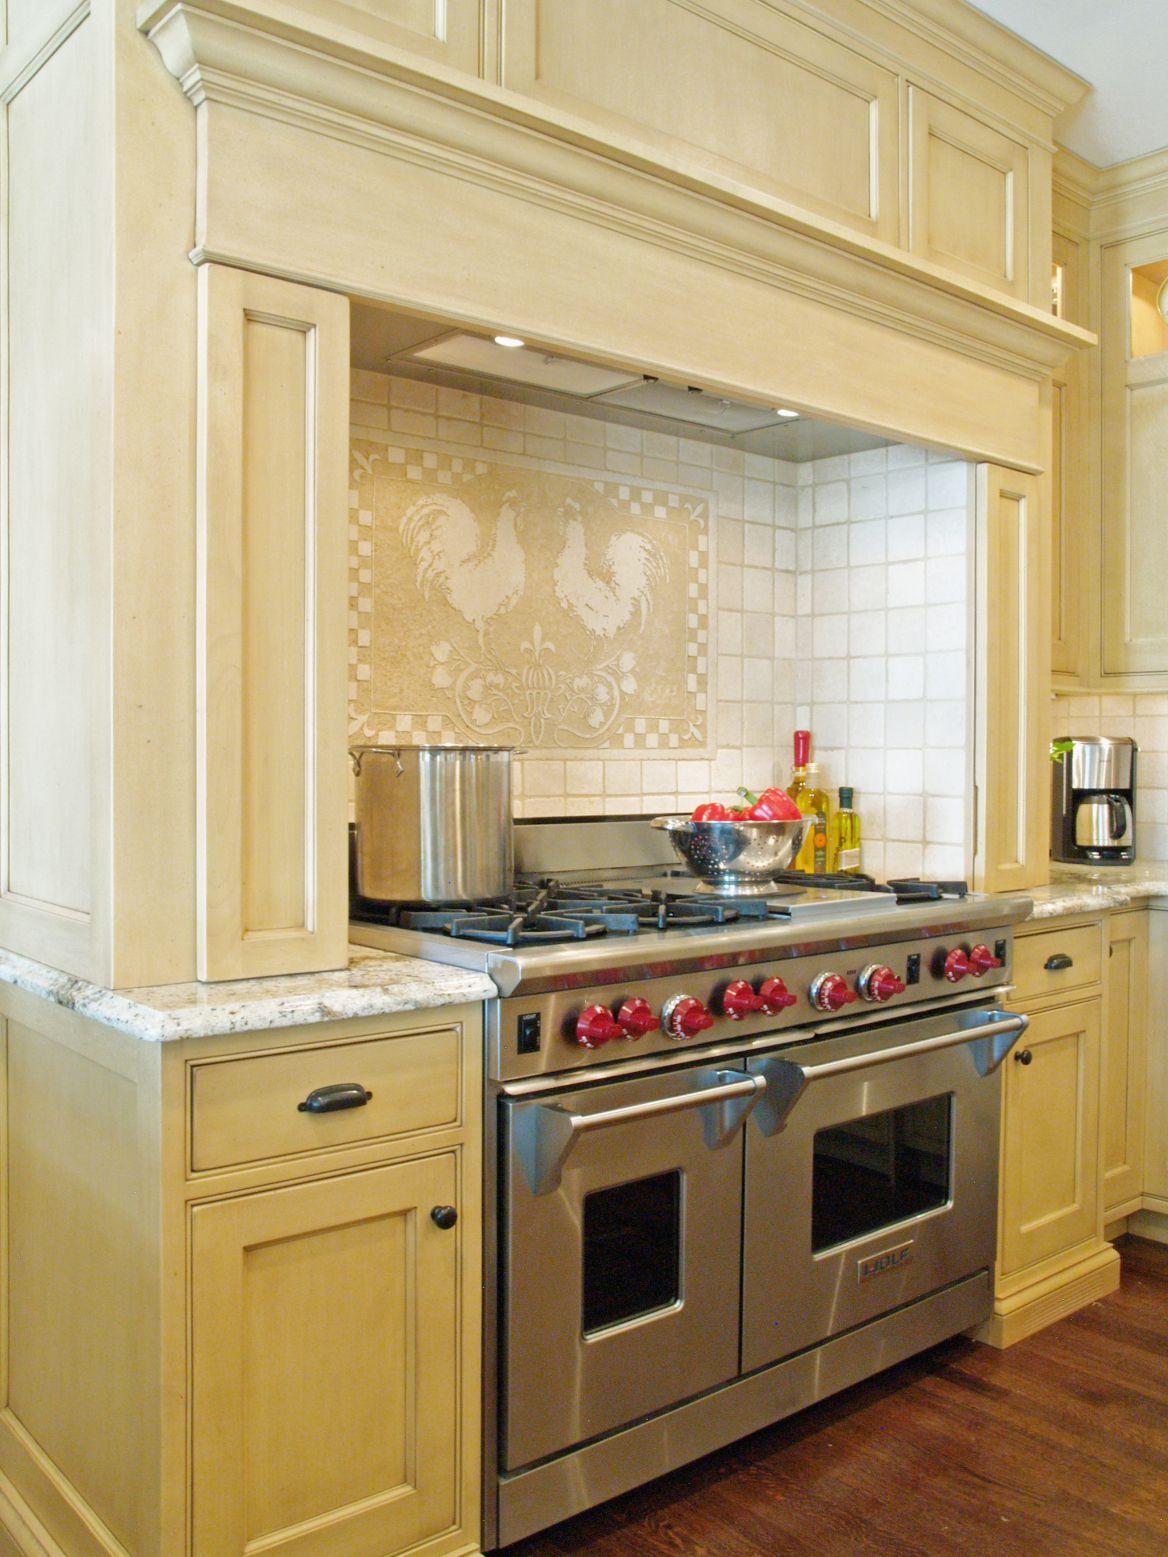 Spice Up Your Kitchen: Tile Backsplash Ideas | Kitchen ...